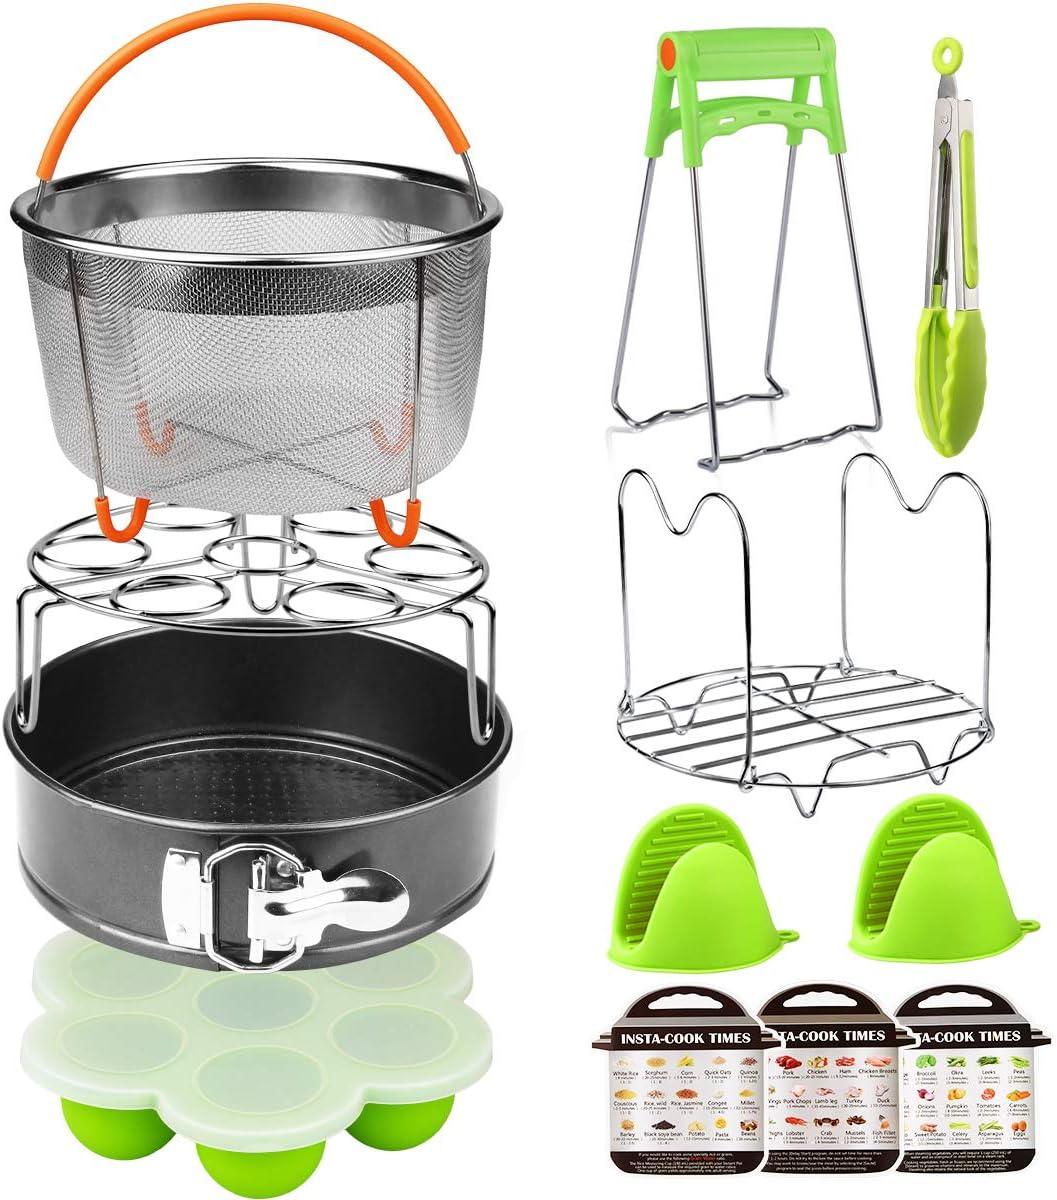 Aiduy 12 Pieces Pressure Cooker Accessories Set, Compatible with Instant Pot 6,8Qt-Steamer Basket, Non-stick Springform Pan, Egg Bites Mold, Egg Rack, Steamer Trivet, Kitchen Tongs, 3 sheets